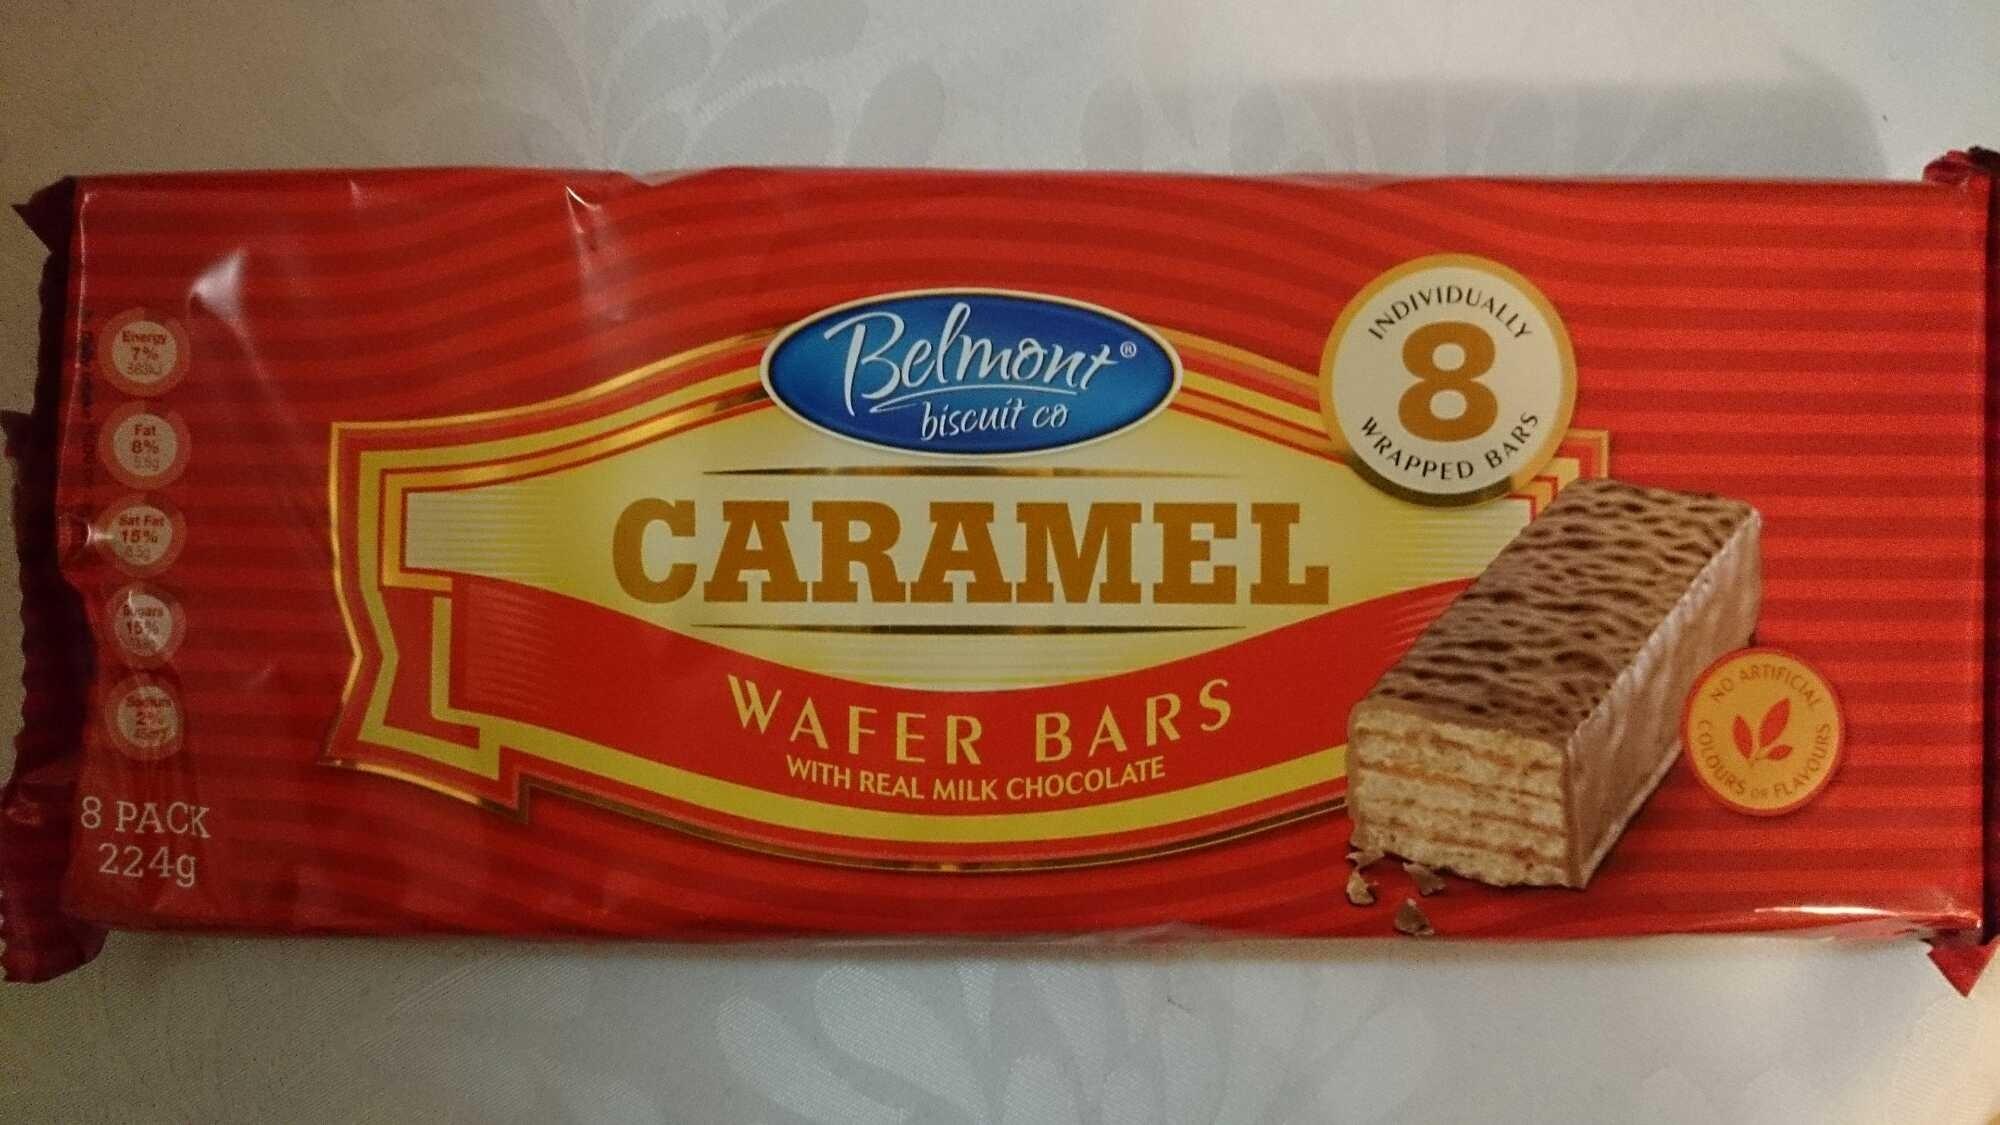 Caramel Wafer Bars Caramel Wafer Bars Product